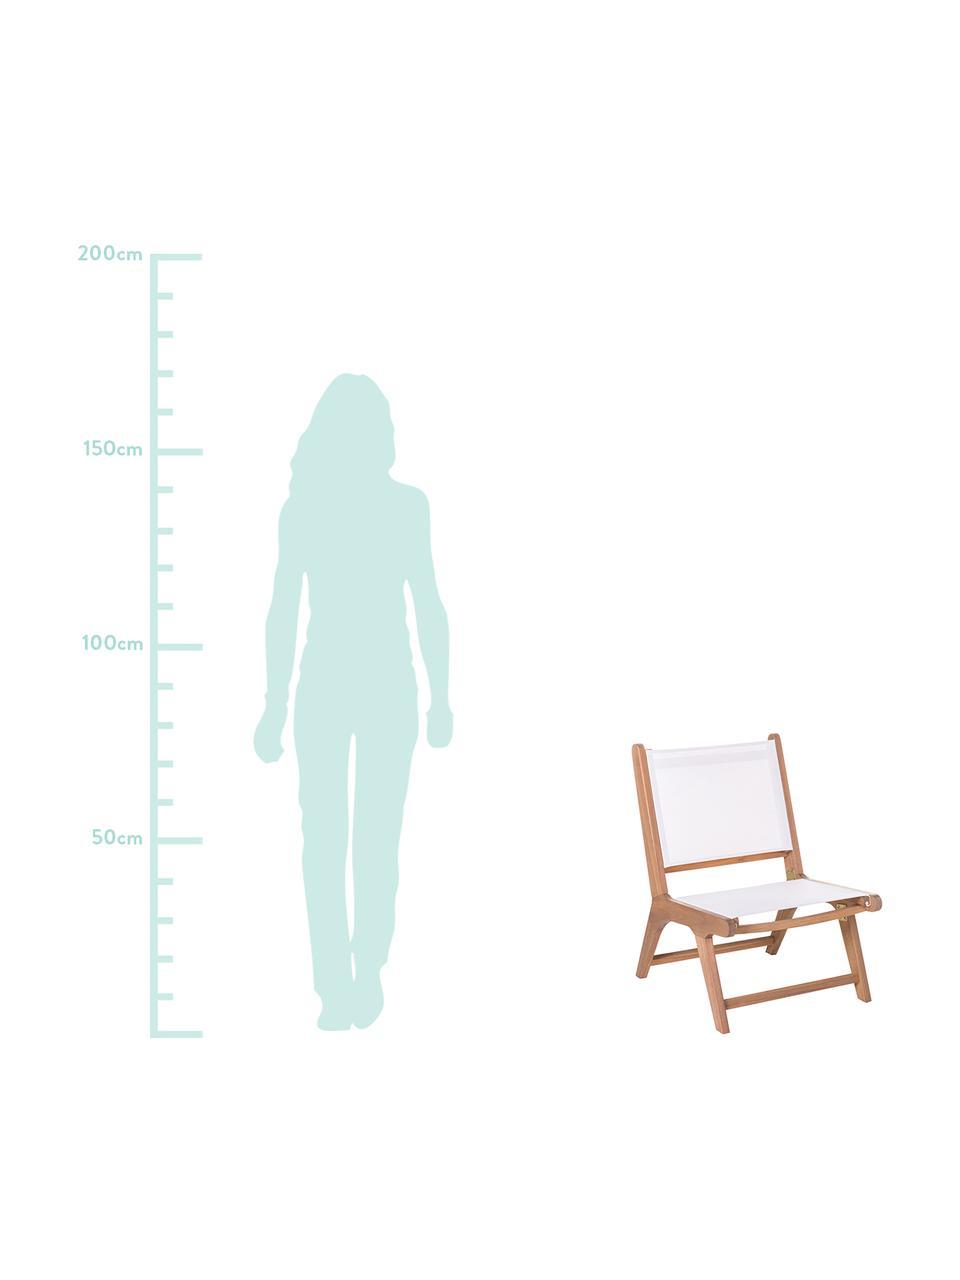 Garten-Loungesessel Nina aus Akazienholz, Gestell: Akazienholz, massiv, Weiß, B 50 x T 64 cm